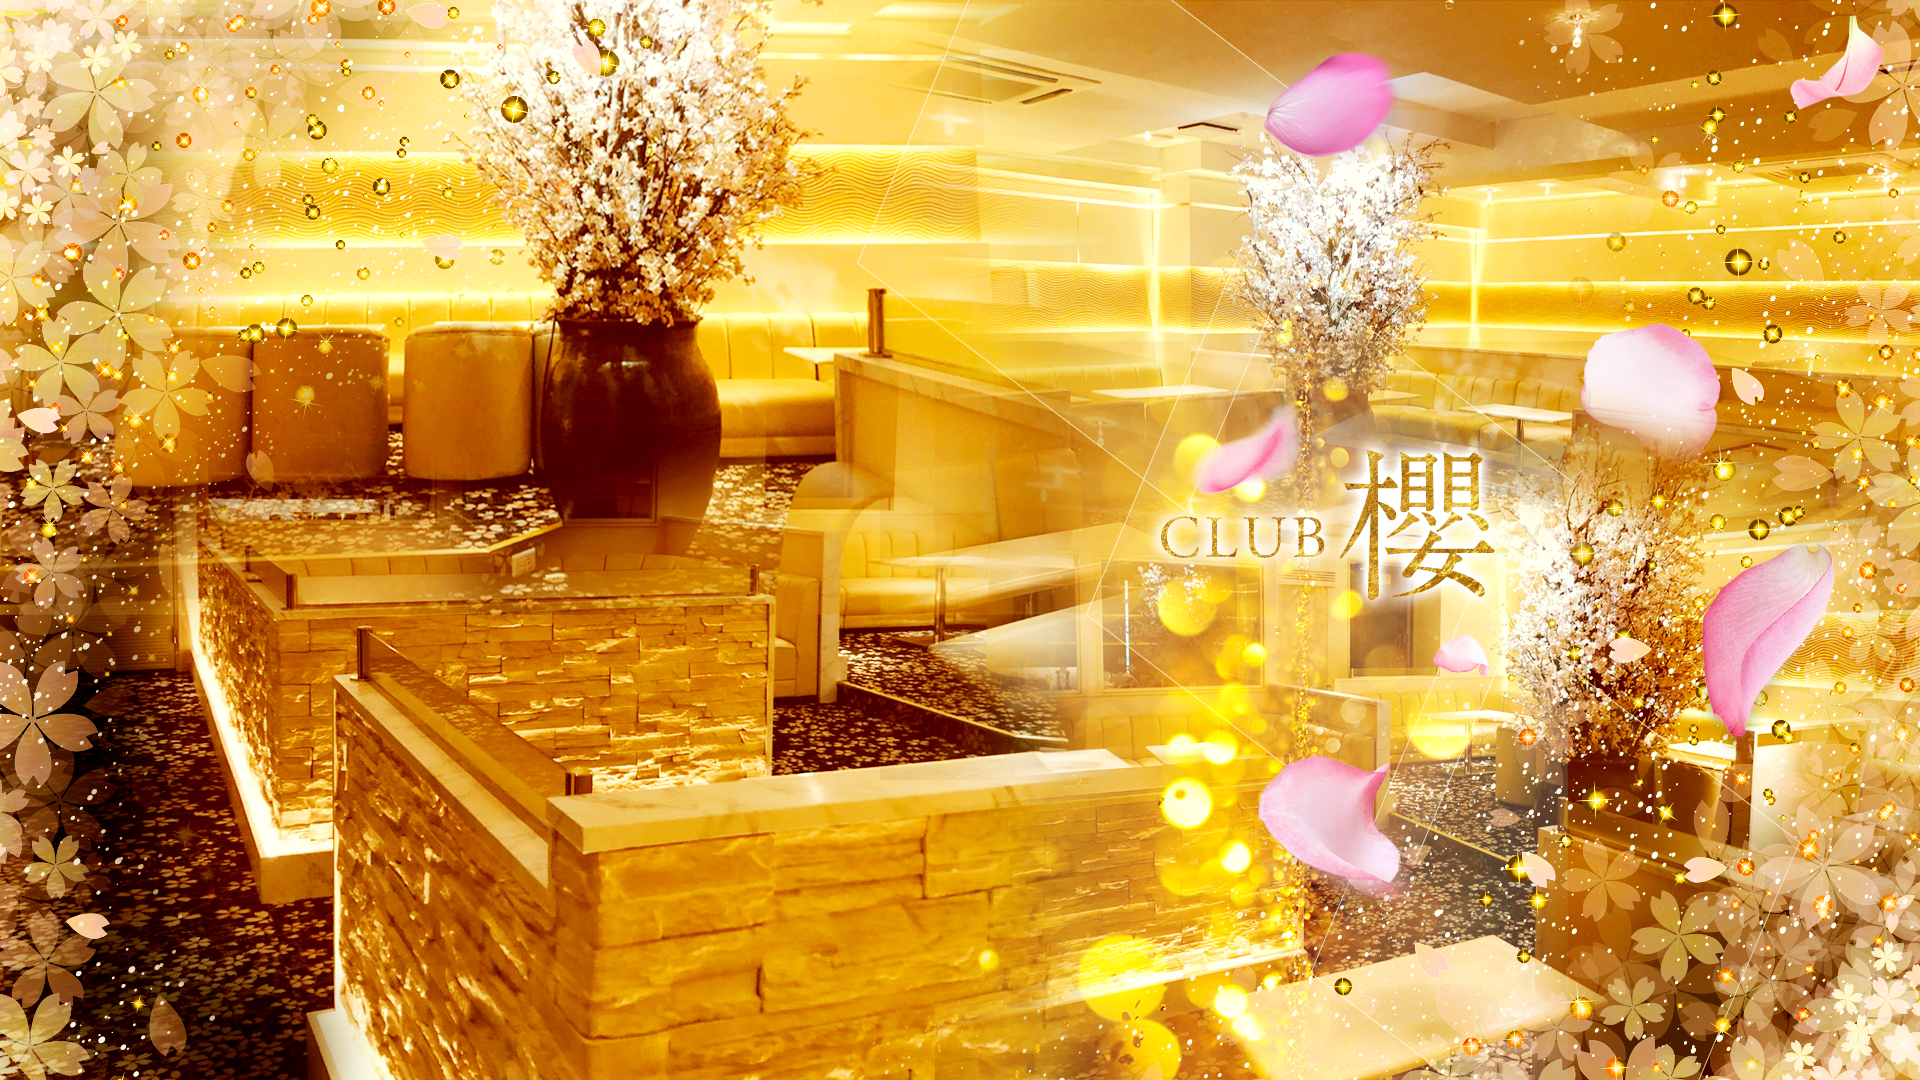 Club櫻[クラブ サクラ] 八王子 キャバクラ TOP画像